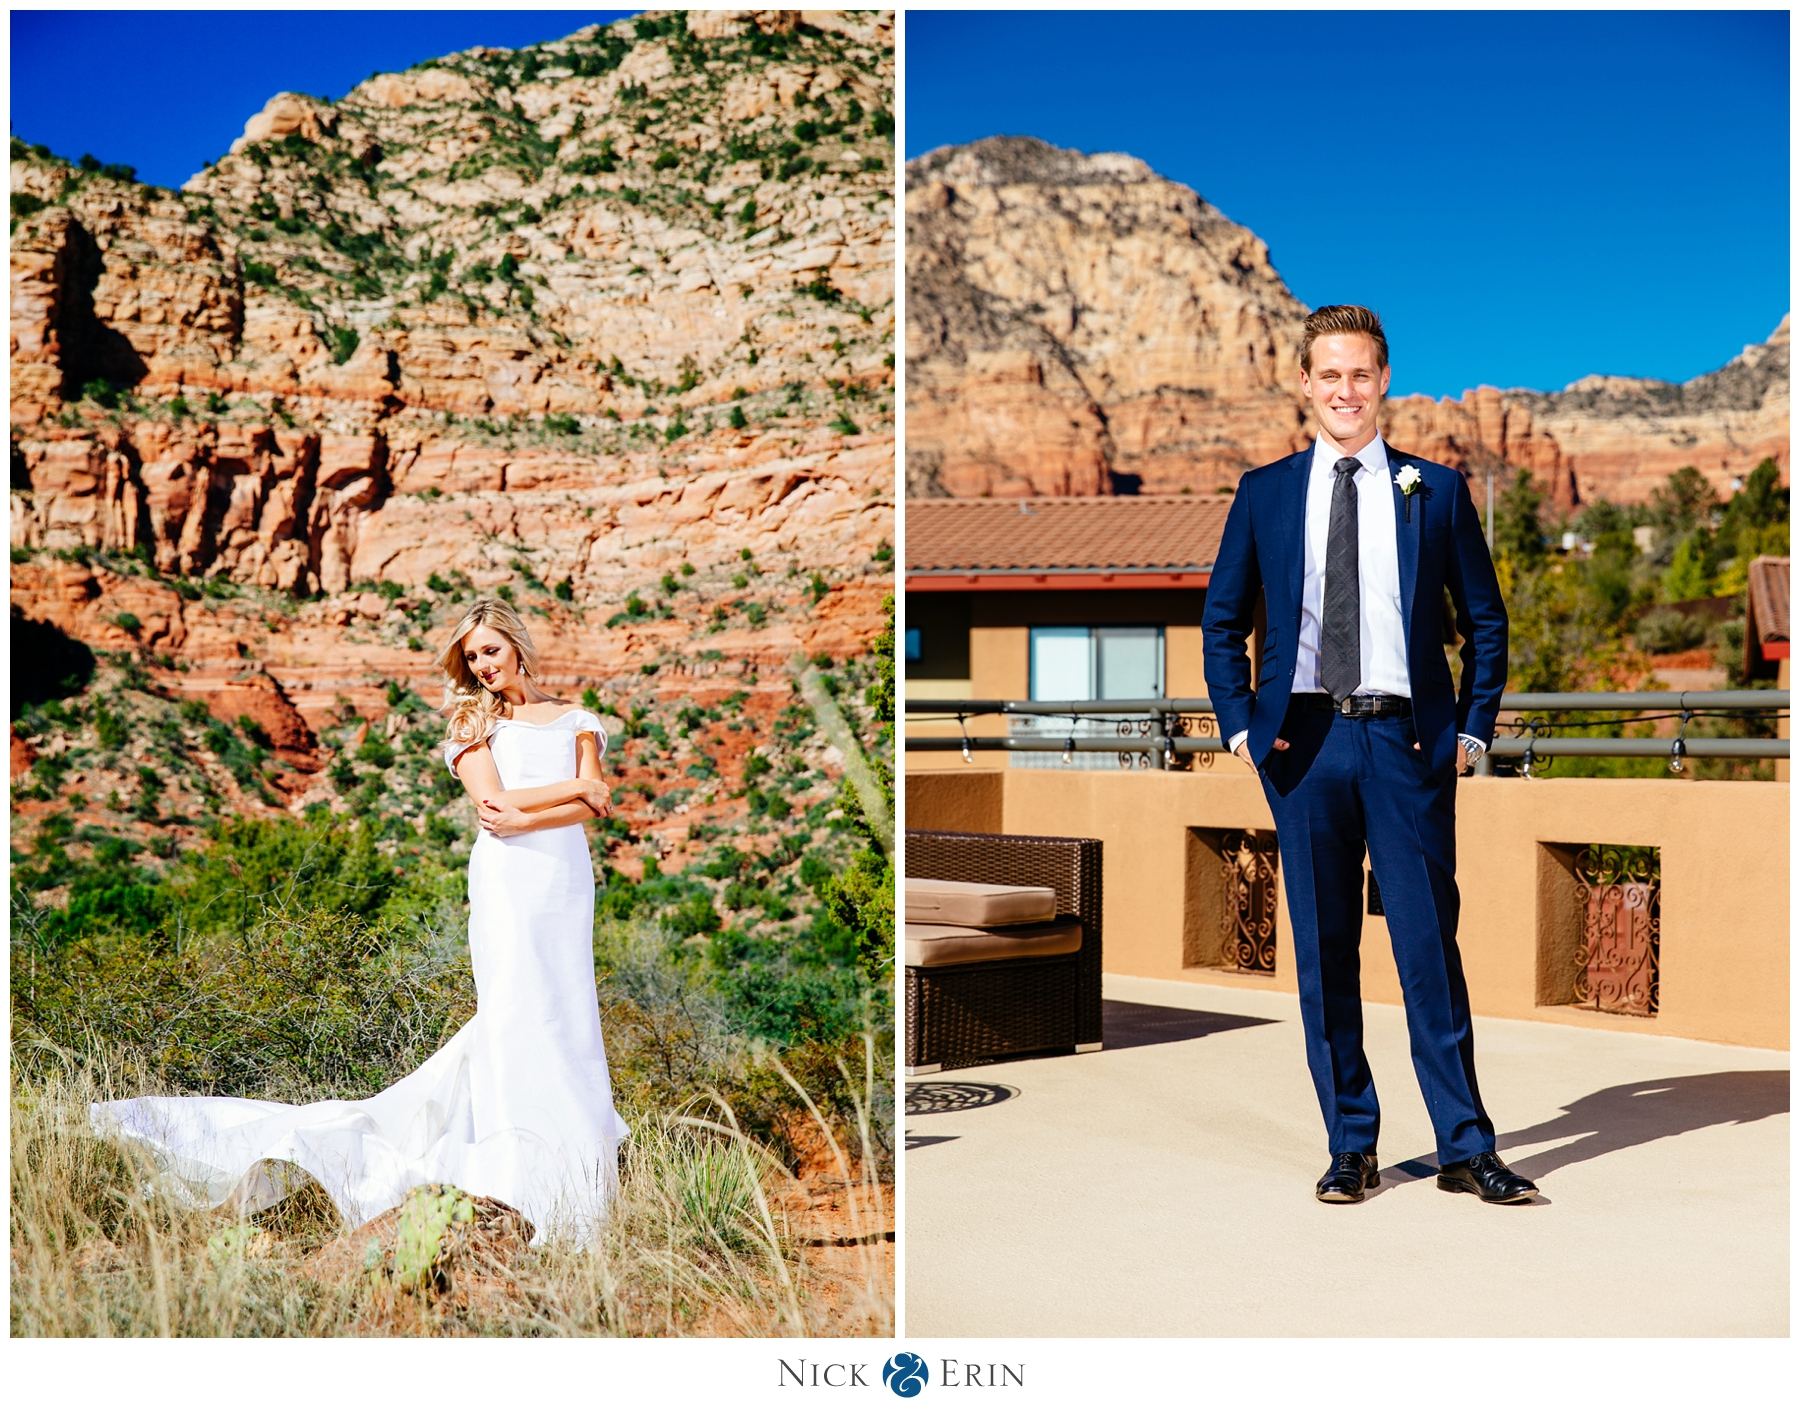 Donner_Photography_Sedona Arizona Wedding_Alissa and Tom_0011